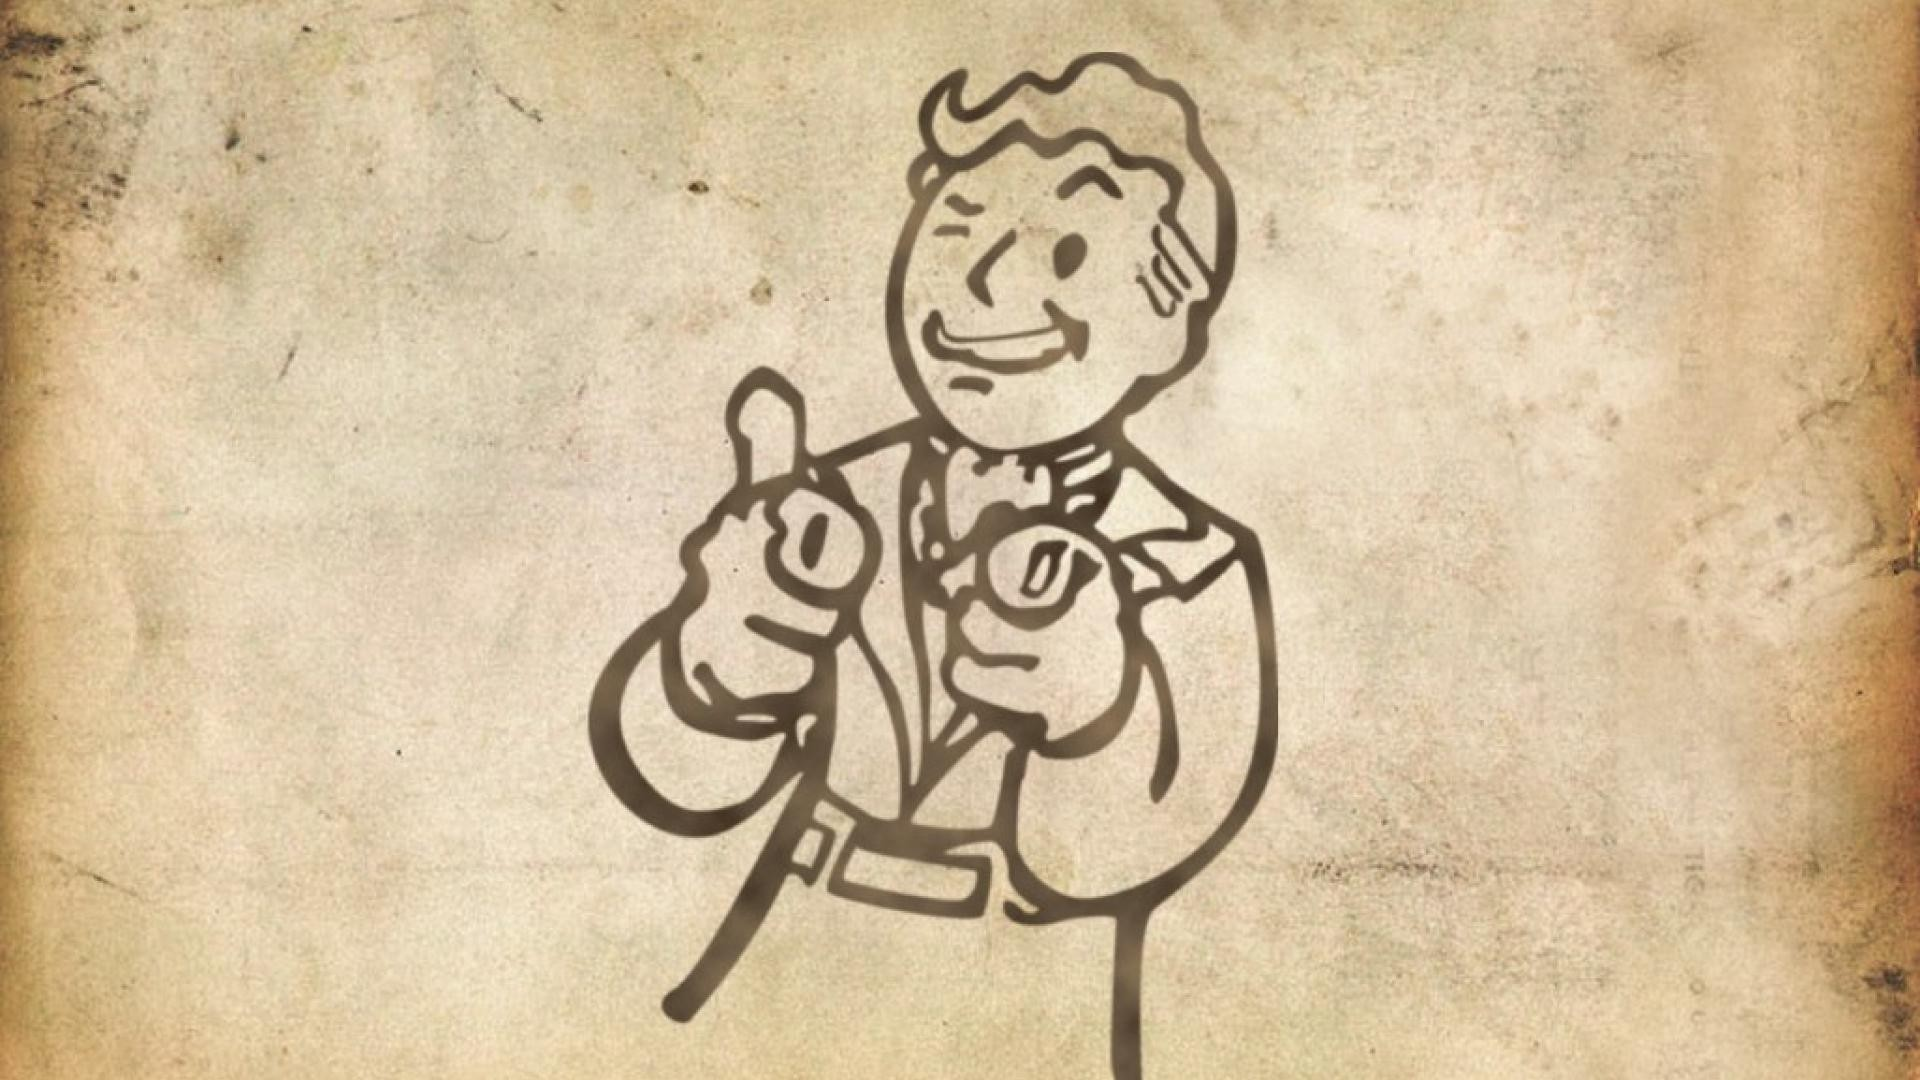 Fall Out Boy Wallpaper Ipad Fallout Vault Boy Wallpaper 183 ① Download Free Amazing High